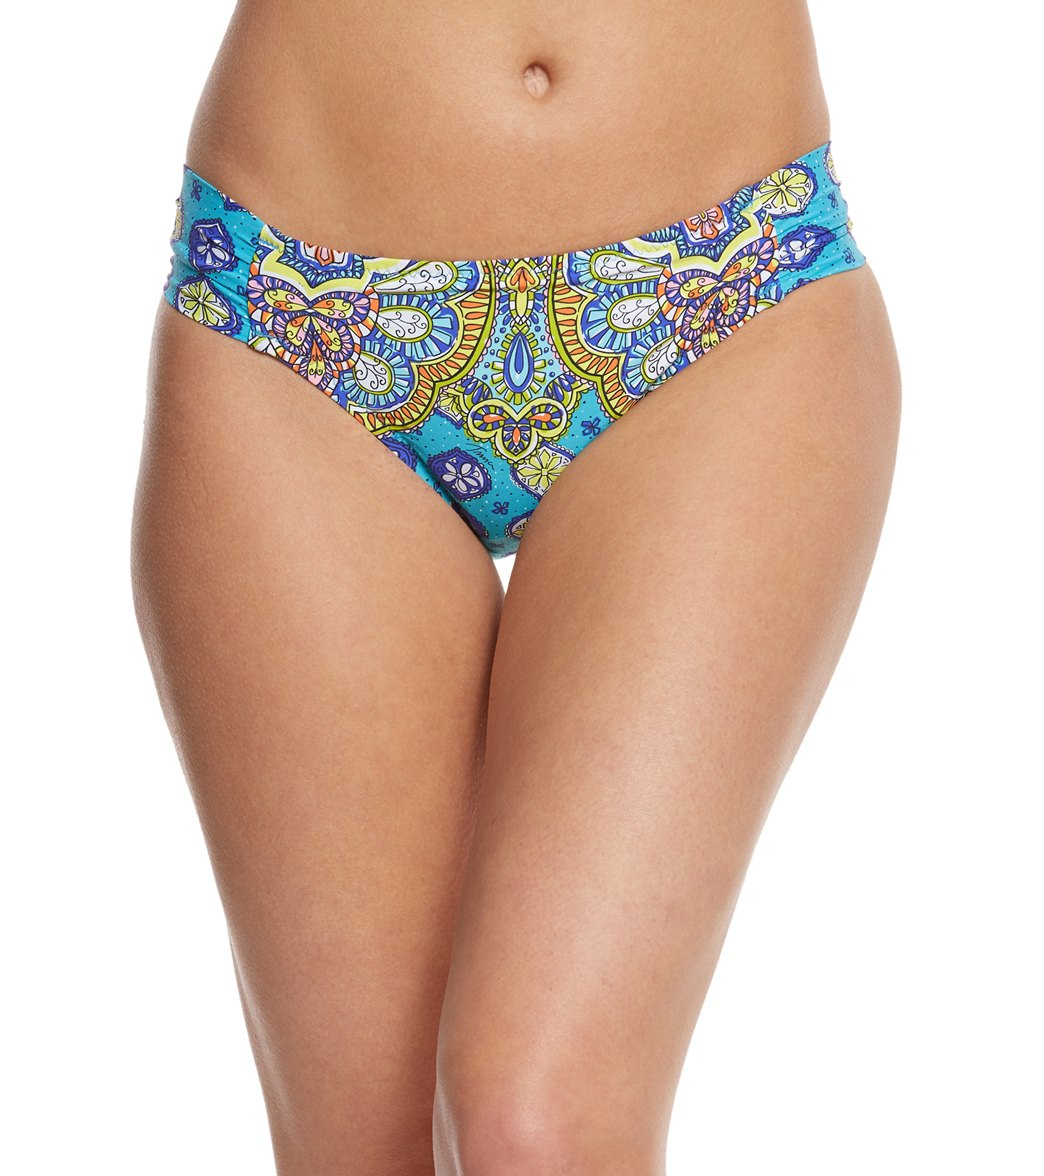 653b54422f Trina Turk Corsica Hipster Bikini Bottom at SwimOutlet.com - Free Shipping